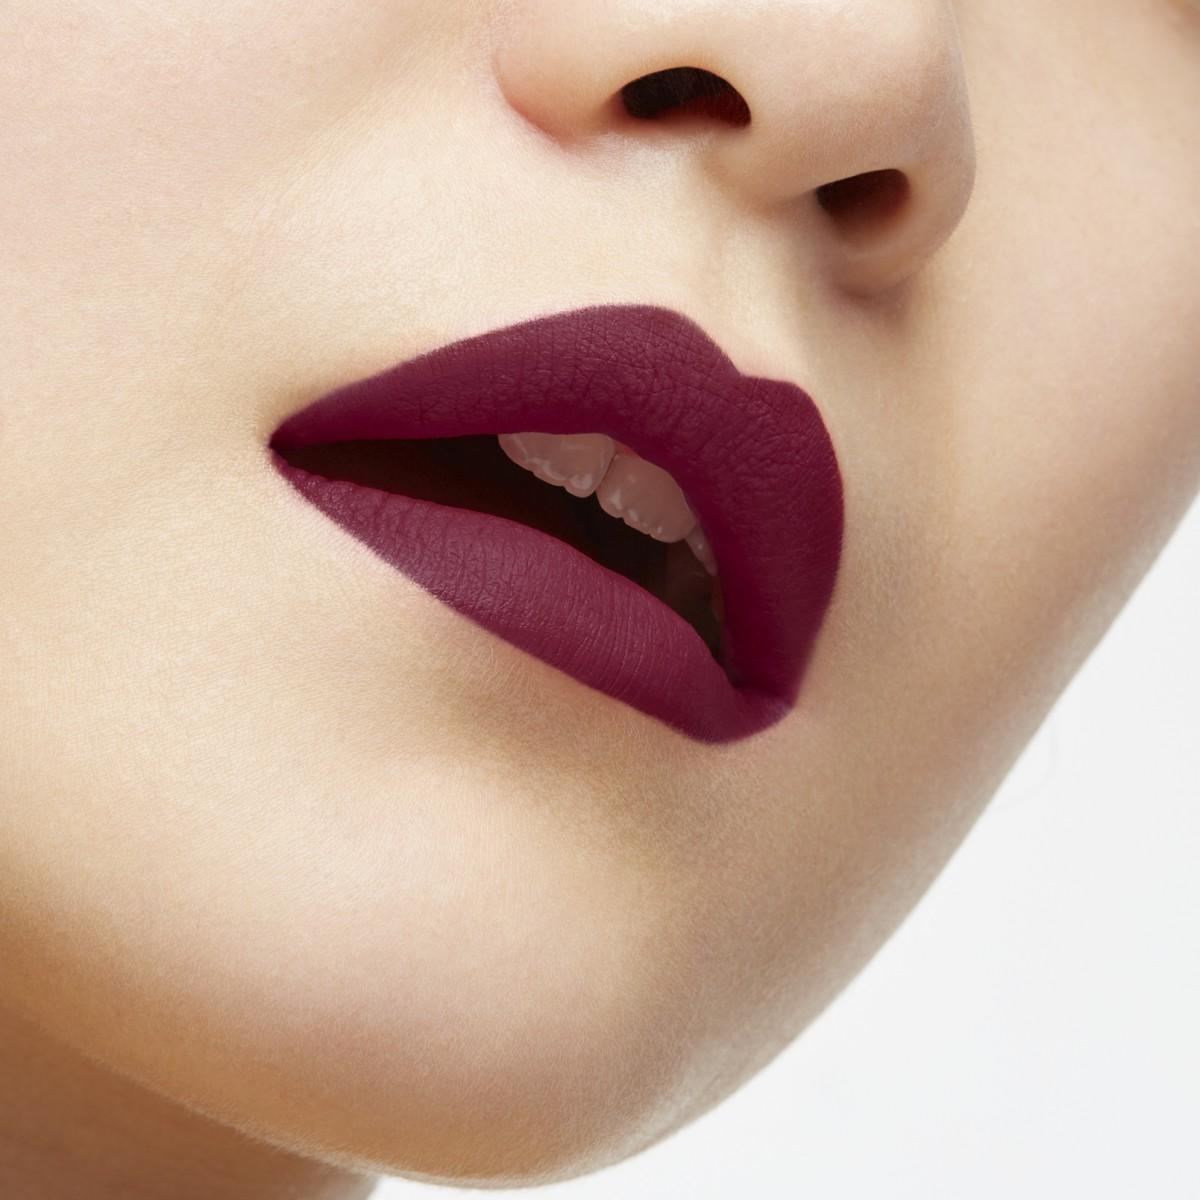 Woman Beauty - リップカラー エトンモワ 330m - Christian Louboutin